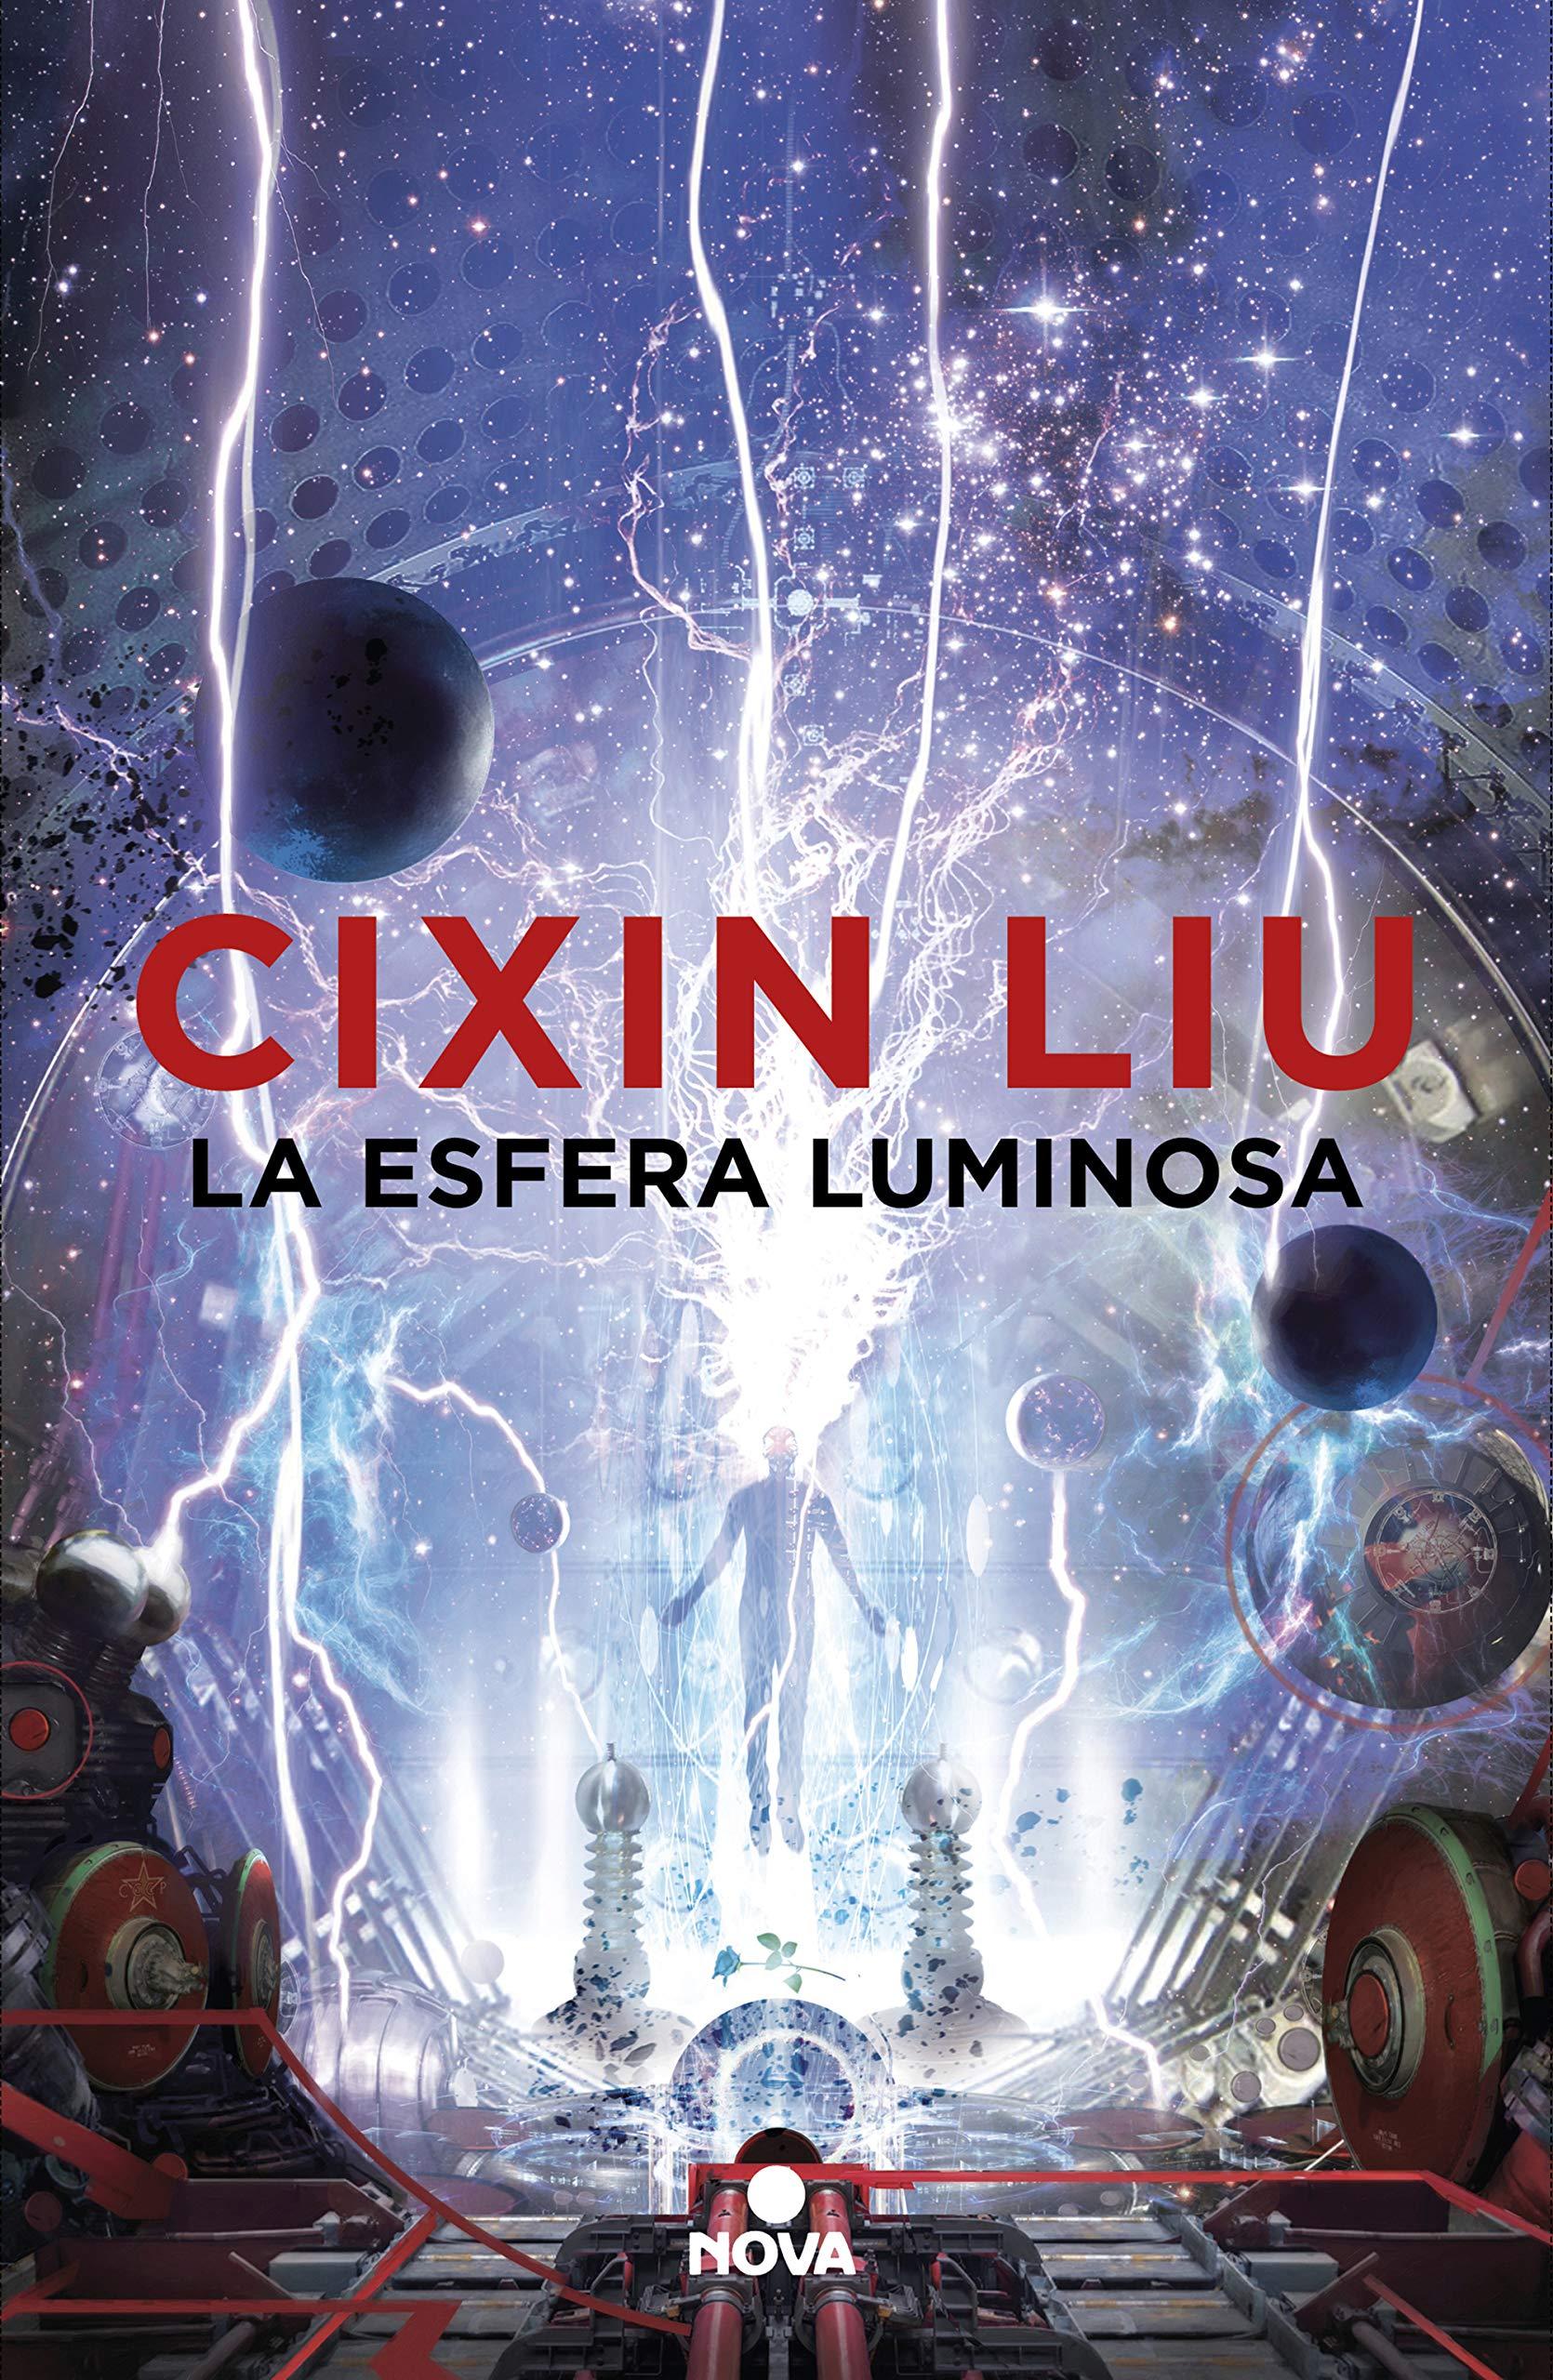 La esfera luminosa por Cixin Liu